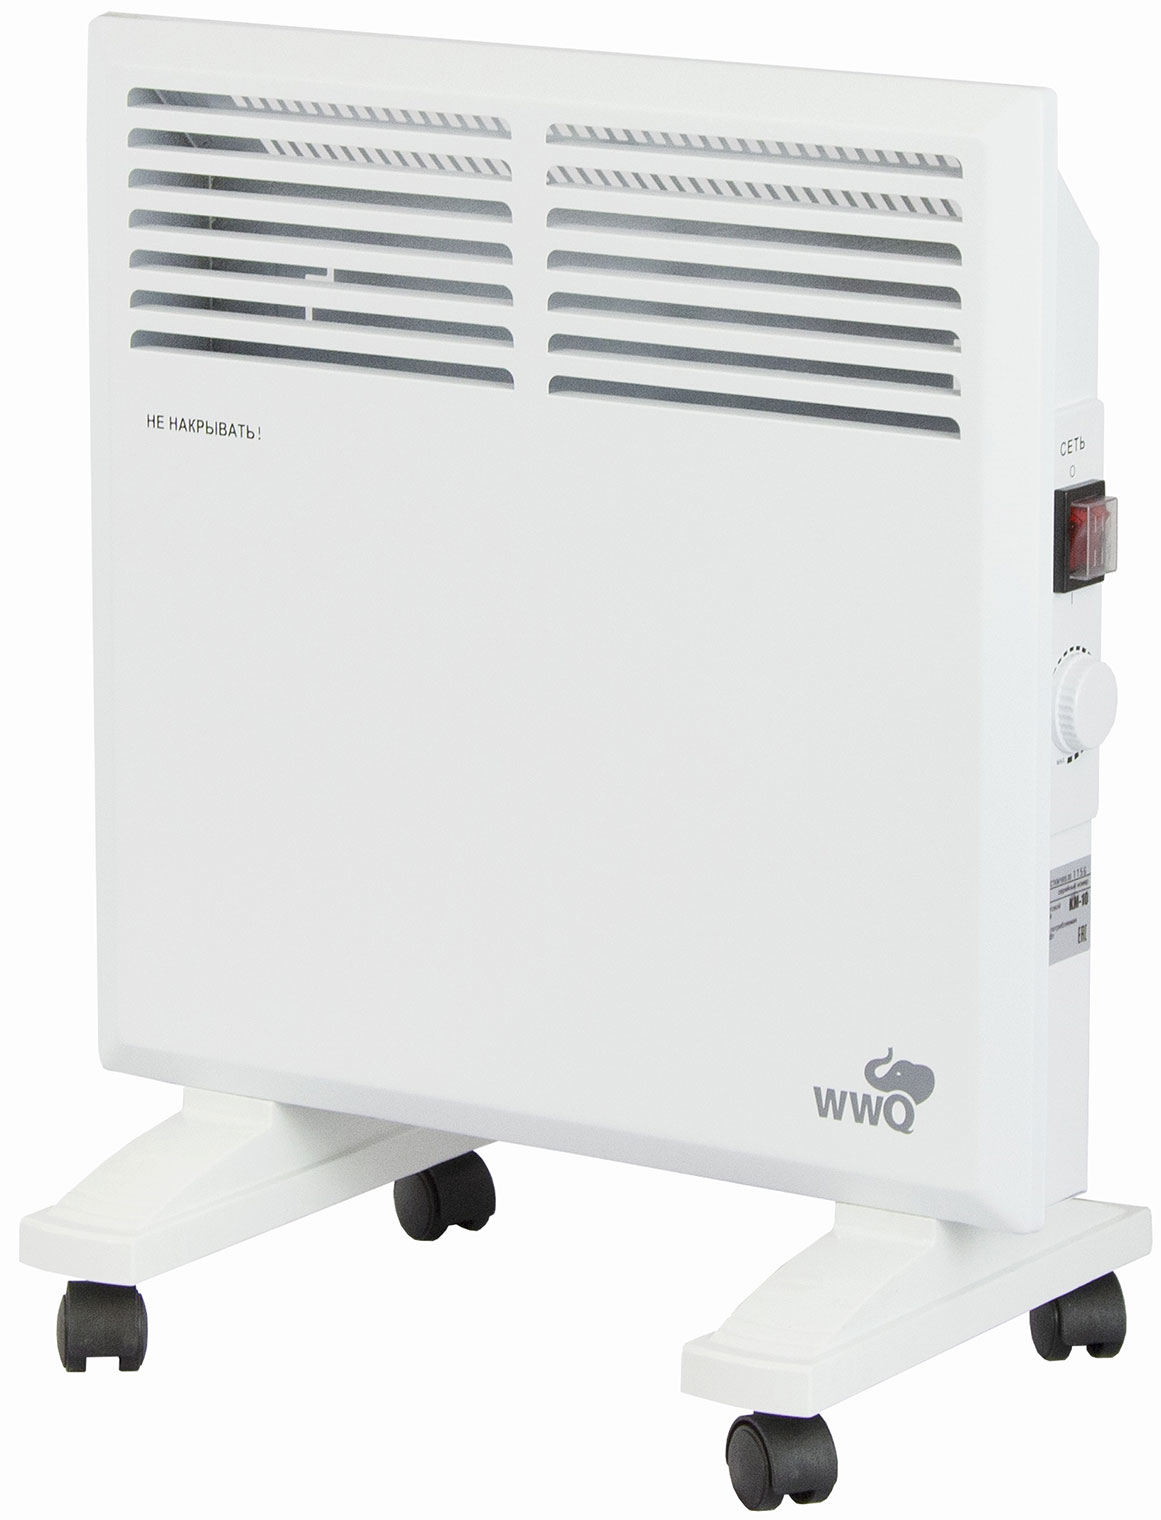 Конвектор WWQ KM 10 белый